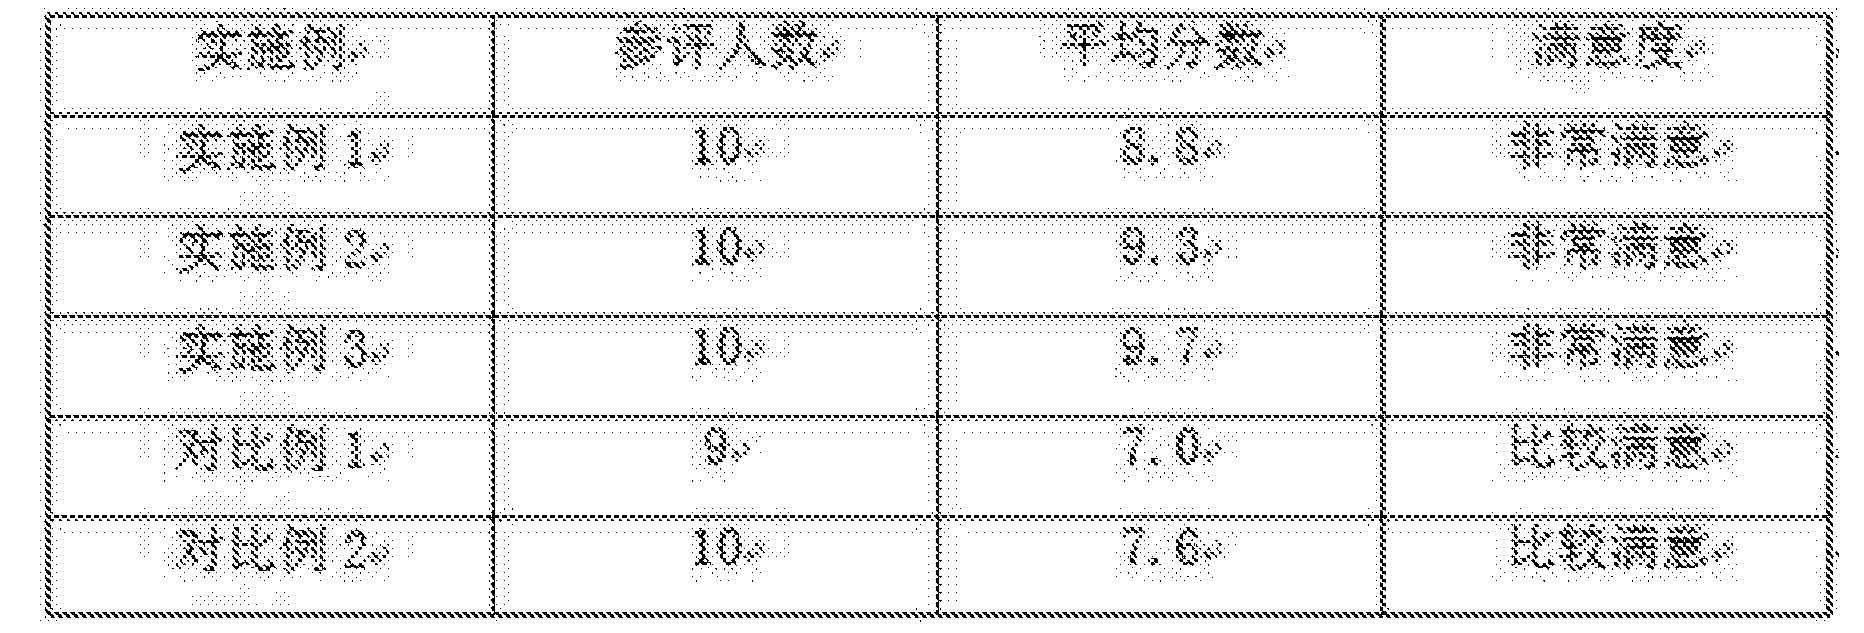 Figure CN107904091AD00062